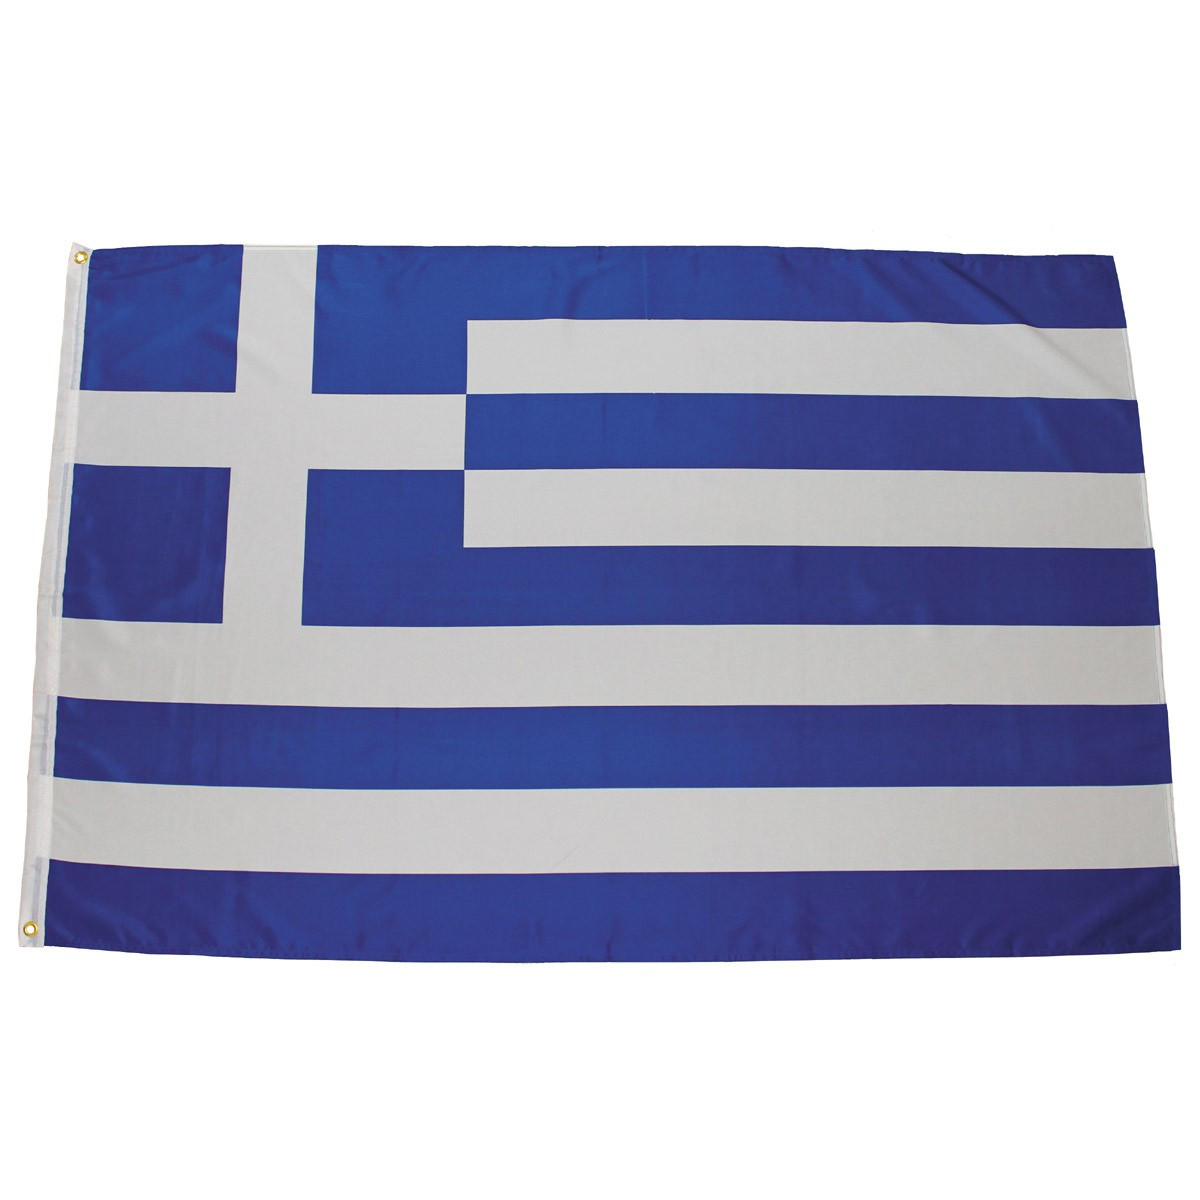 Grécka vlajka Hellas 150x90cm obojstranná polyester megamix.sk